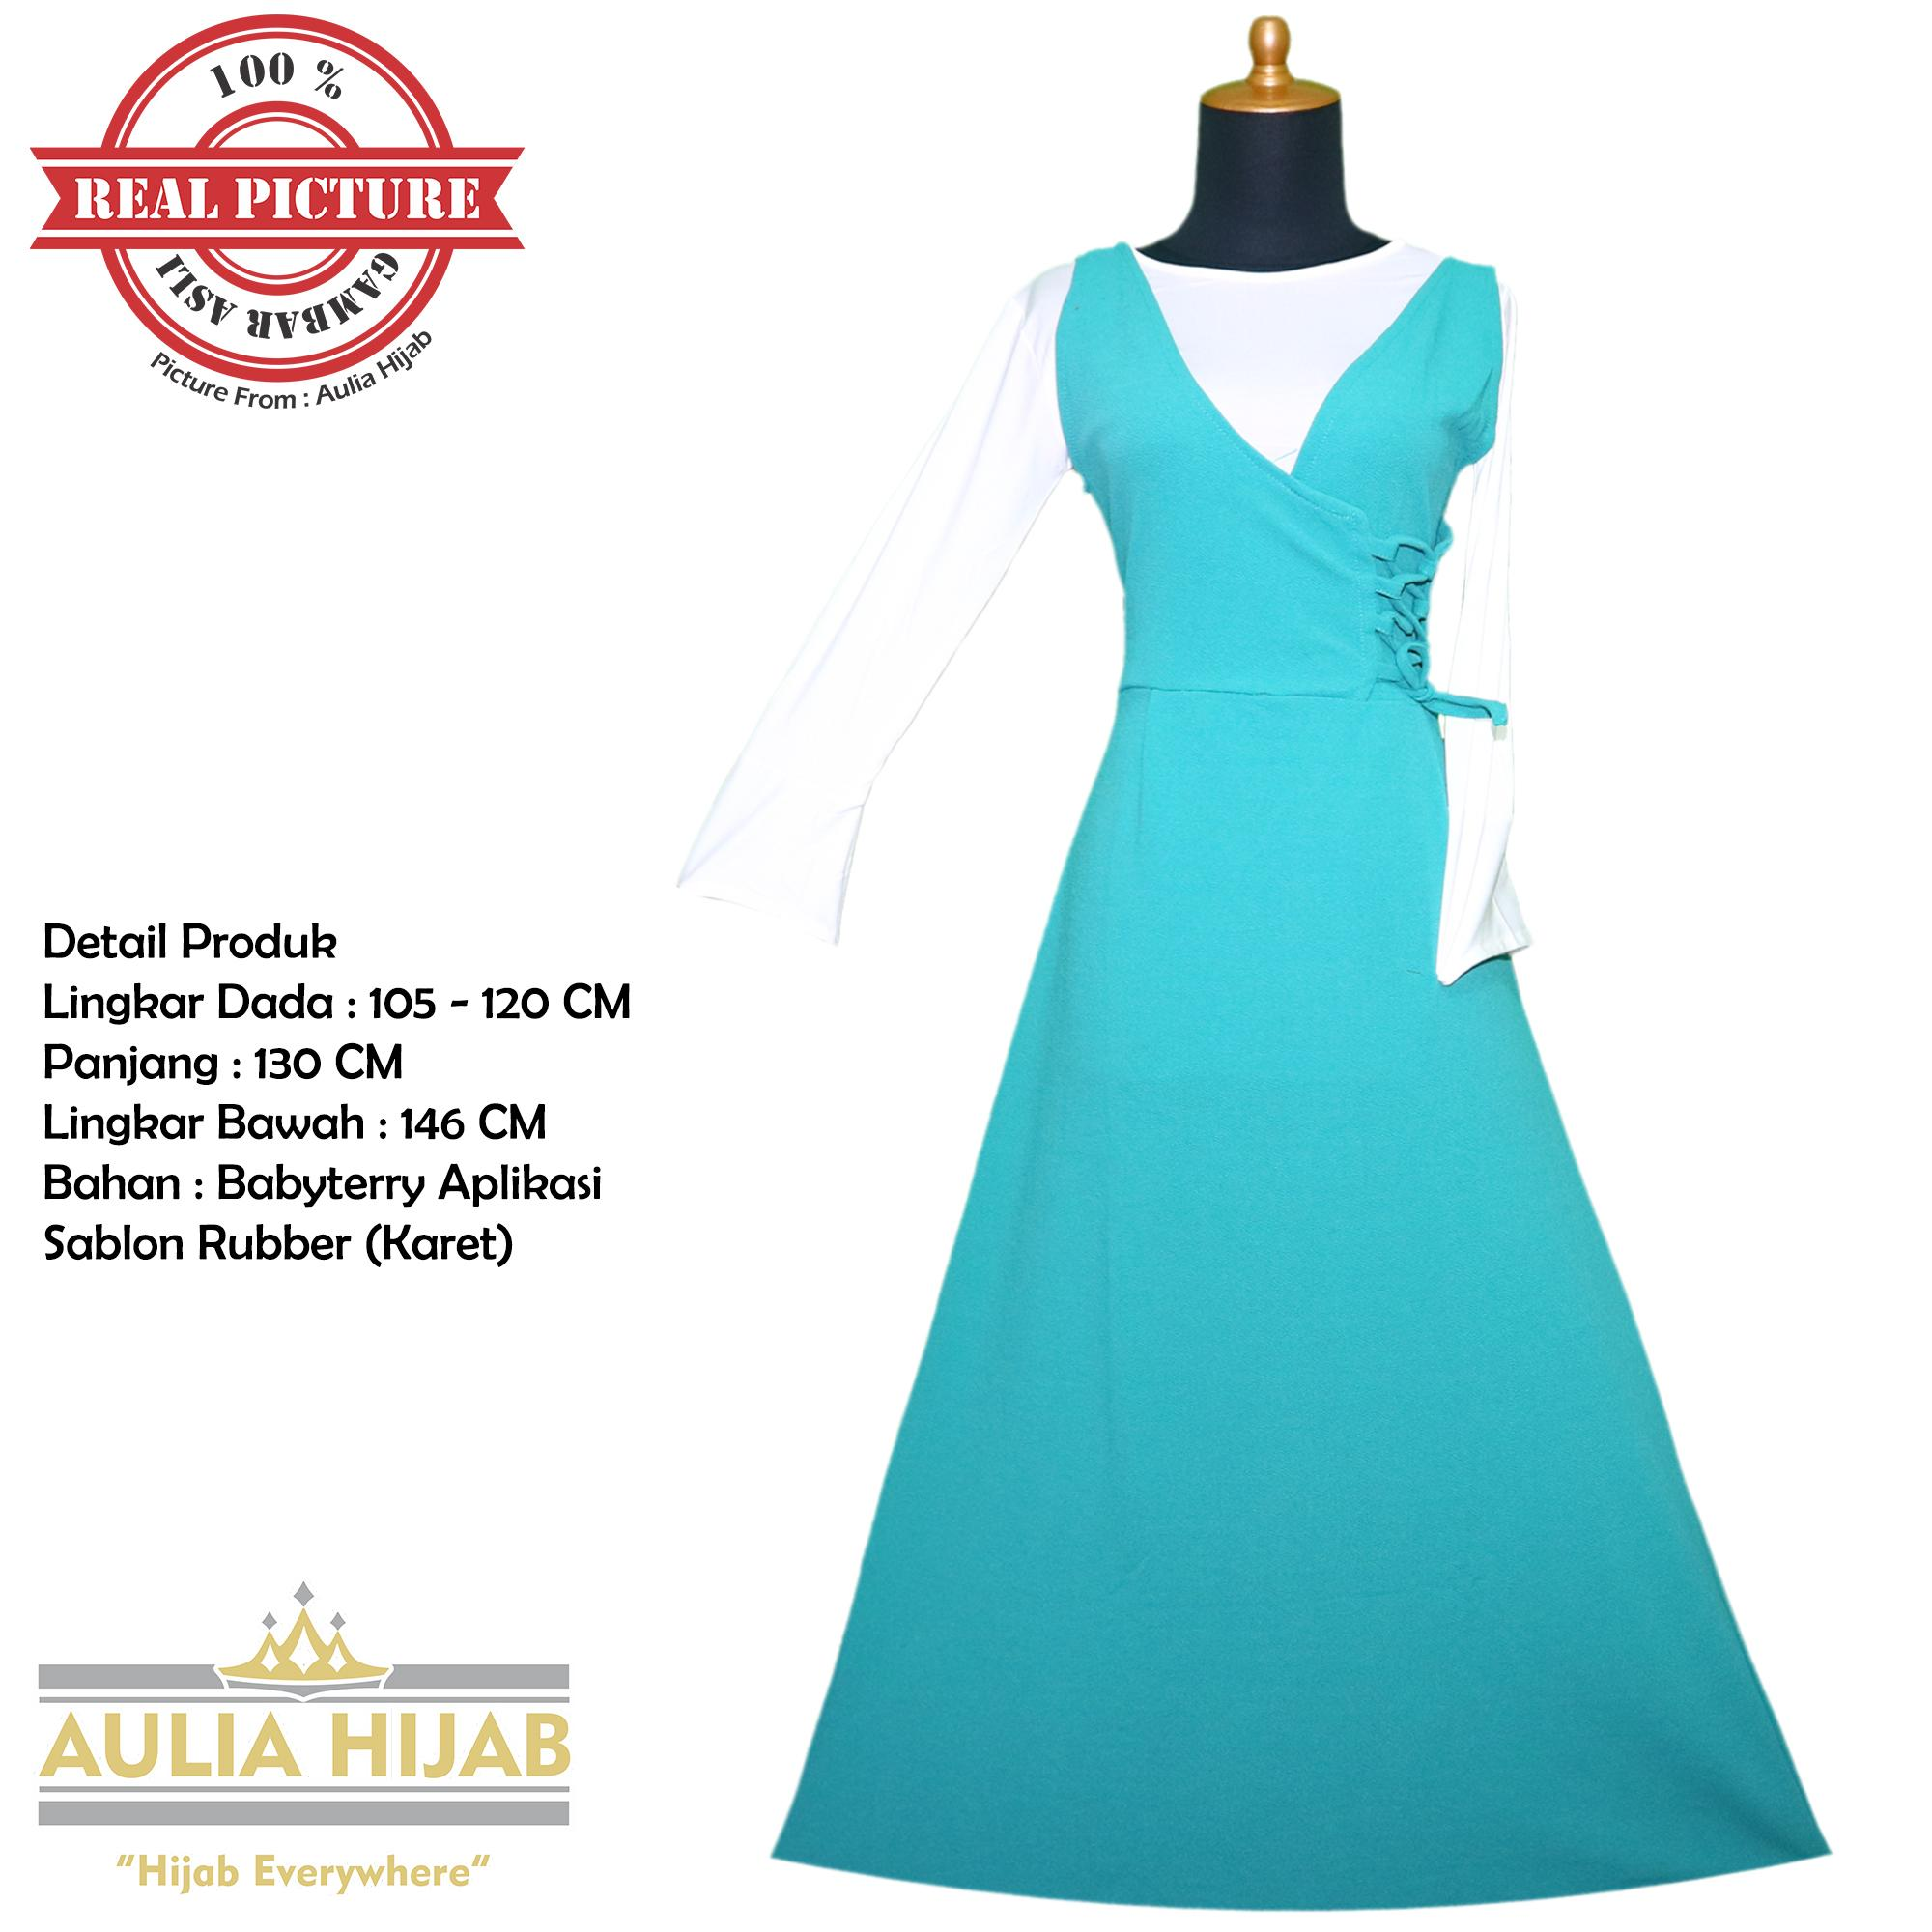 Daftar Harga Baju Overall Termurah November 2018 Bagoong Store Produk Ukm Bumn Kaos Oblong Aulia Hijab Gamis Annie Bahan Sukizi Premium Murah Langsung Terbaru Kodok Pesta